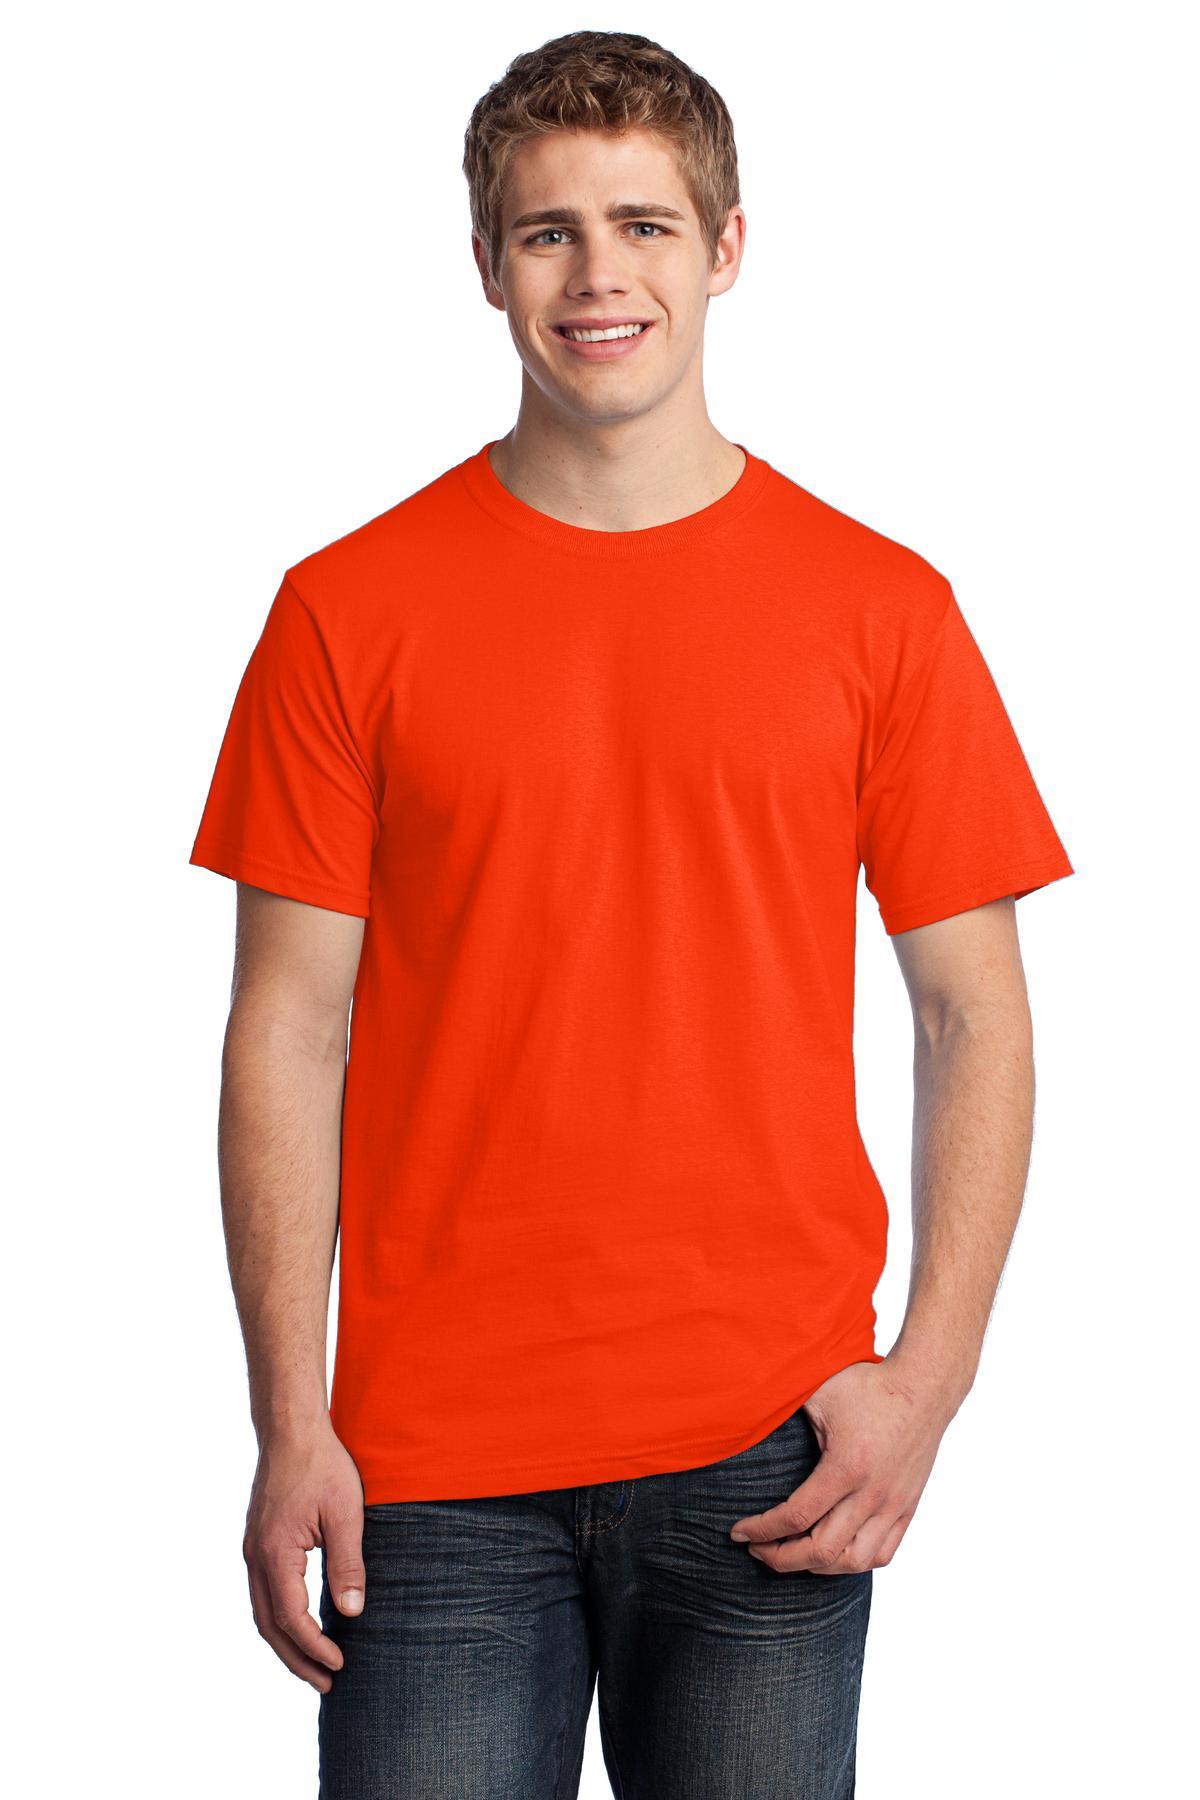 T-Shirts-100-Cotton-16